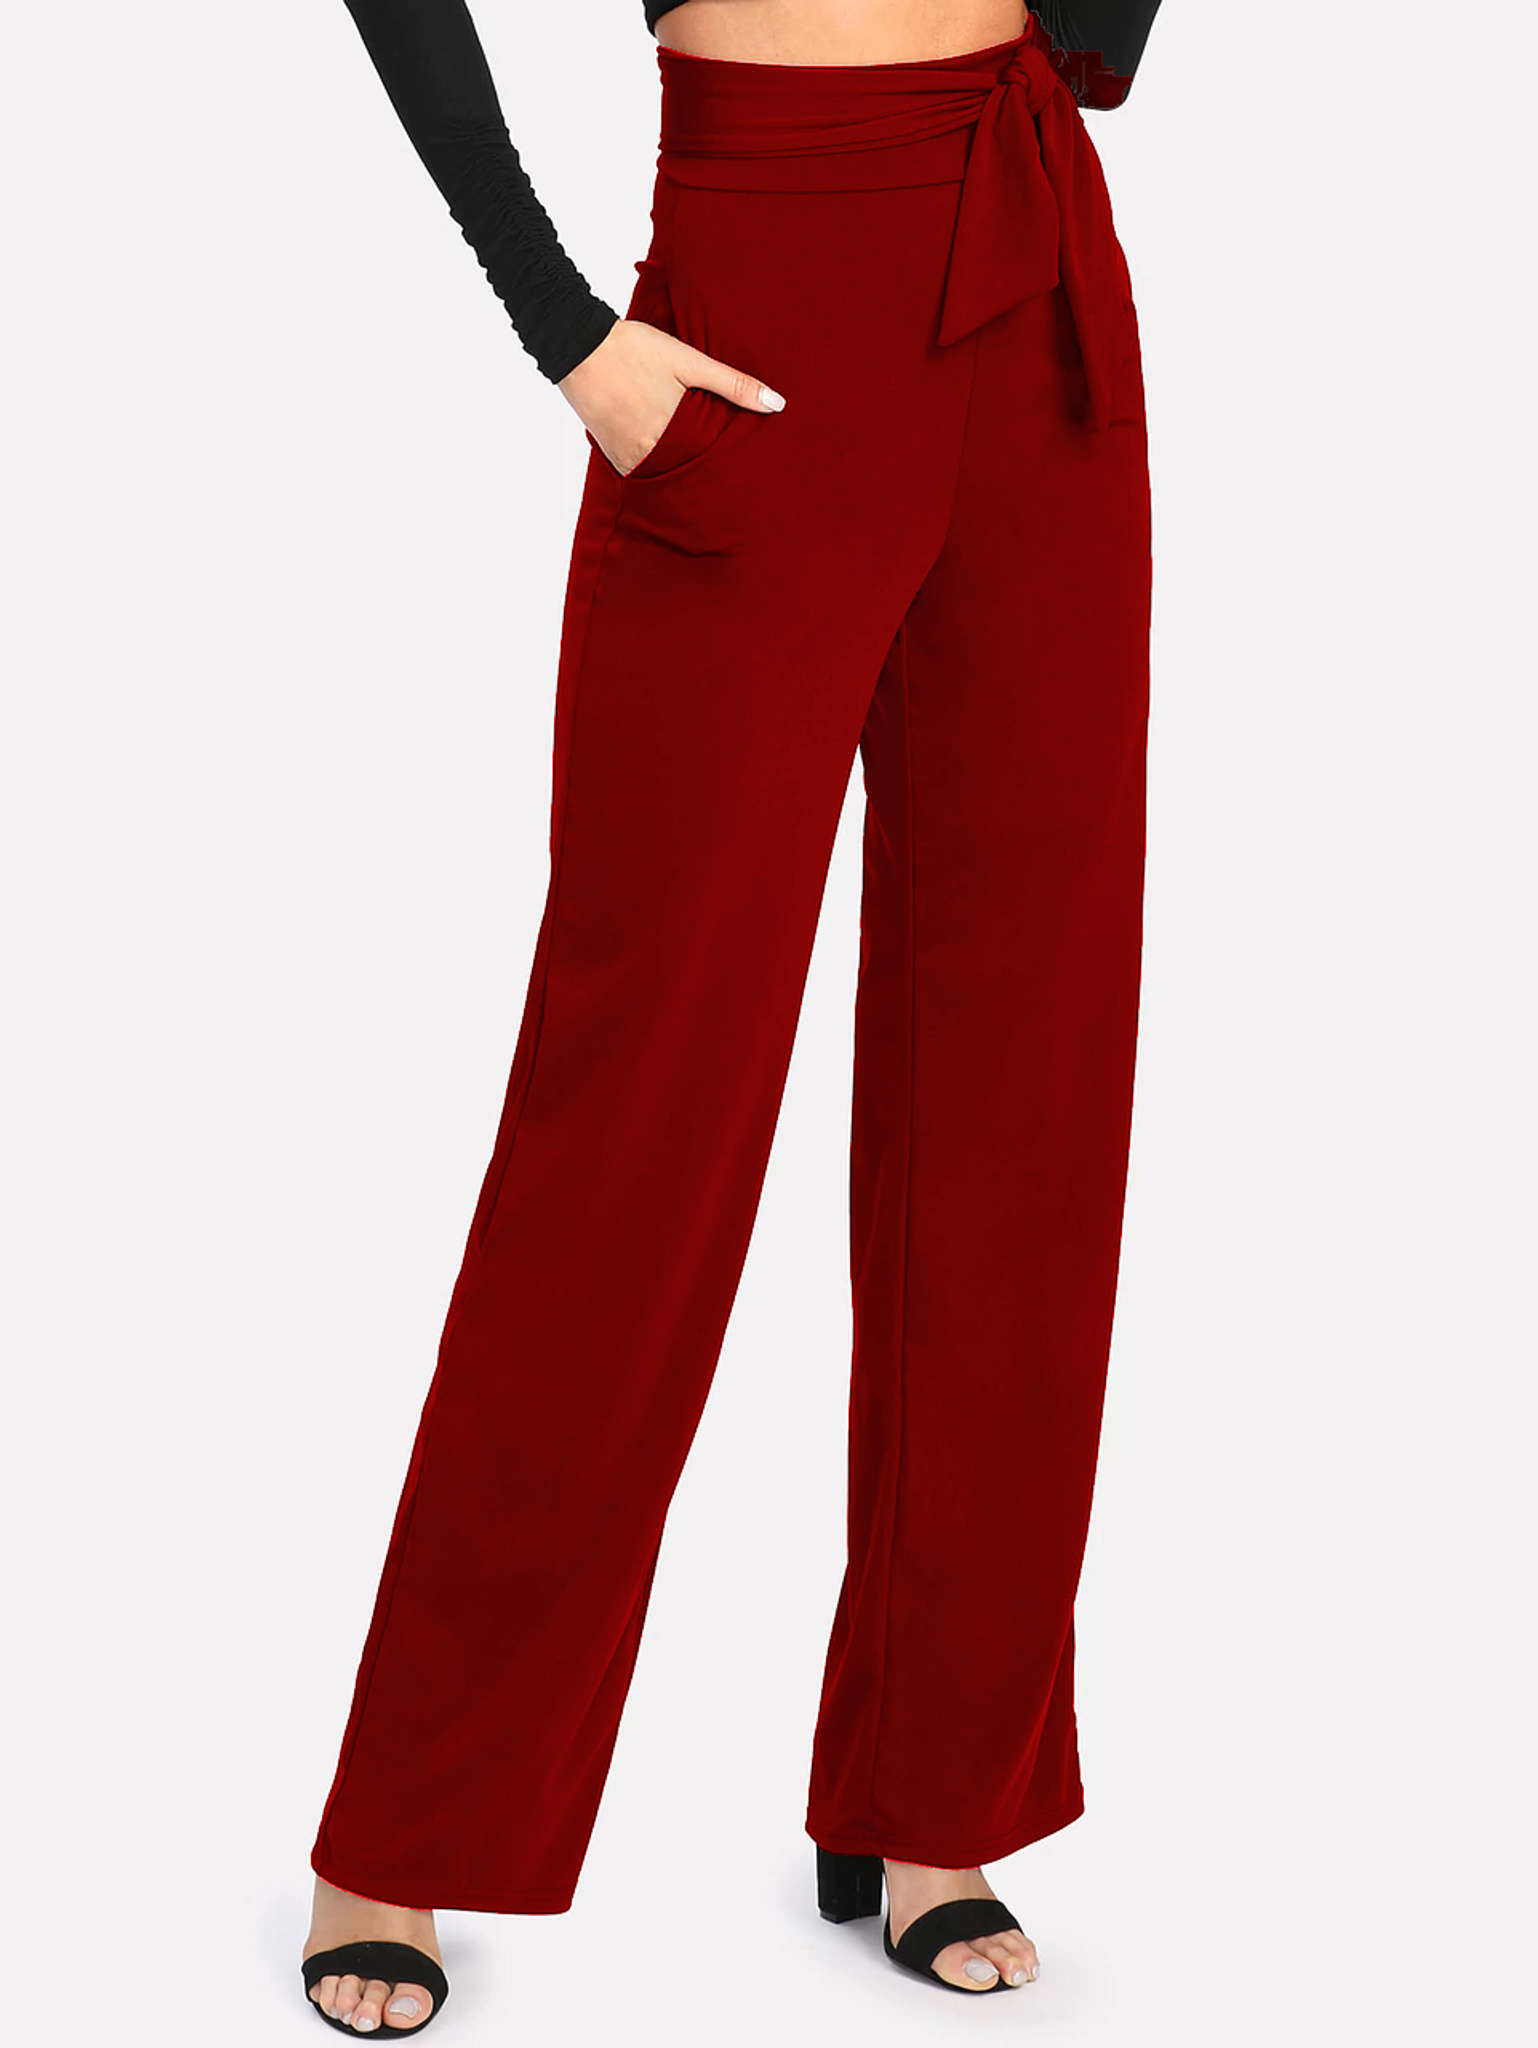 Fifth Avenue Women's NESS Tie Waist Pants - Red